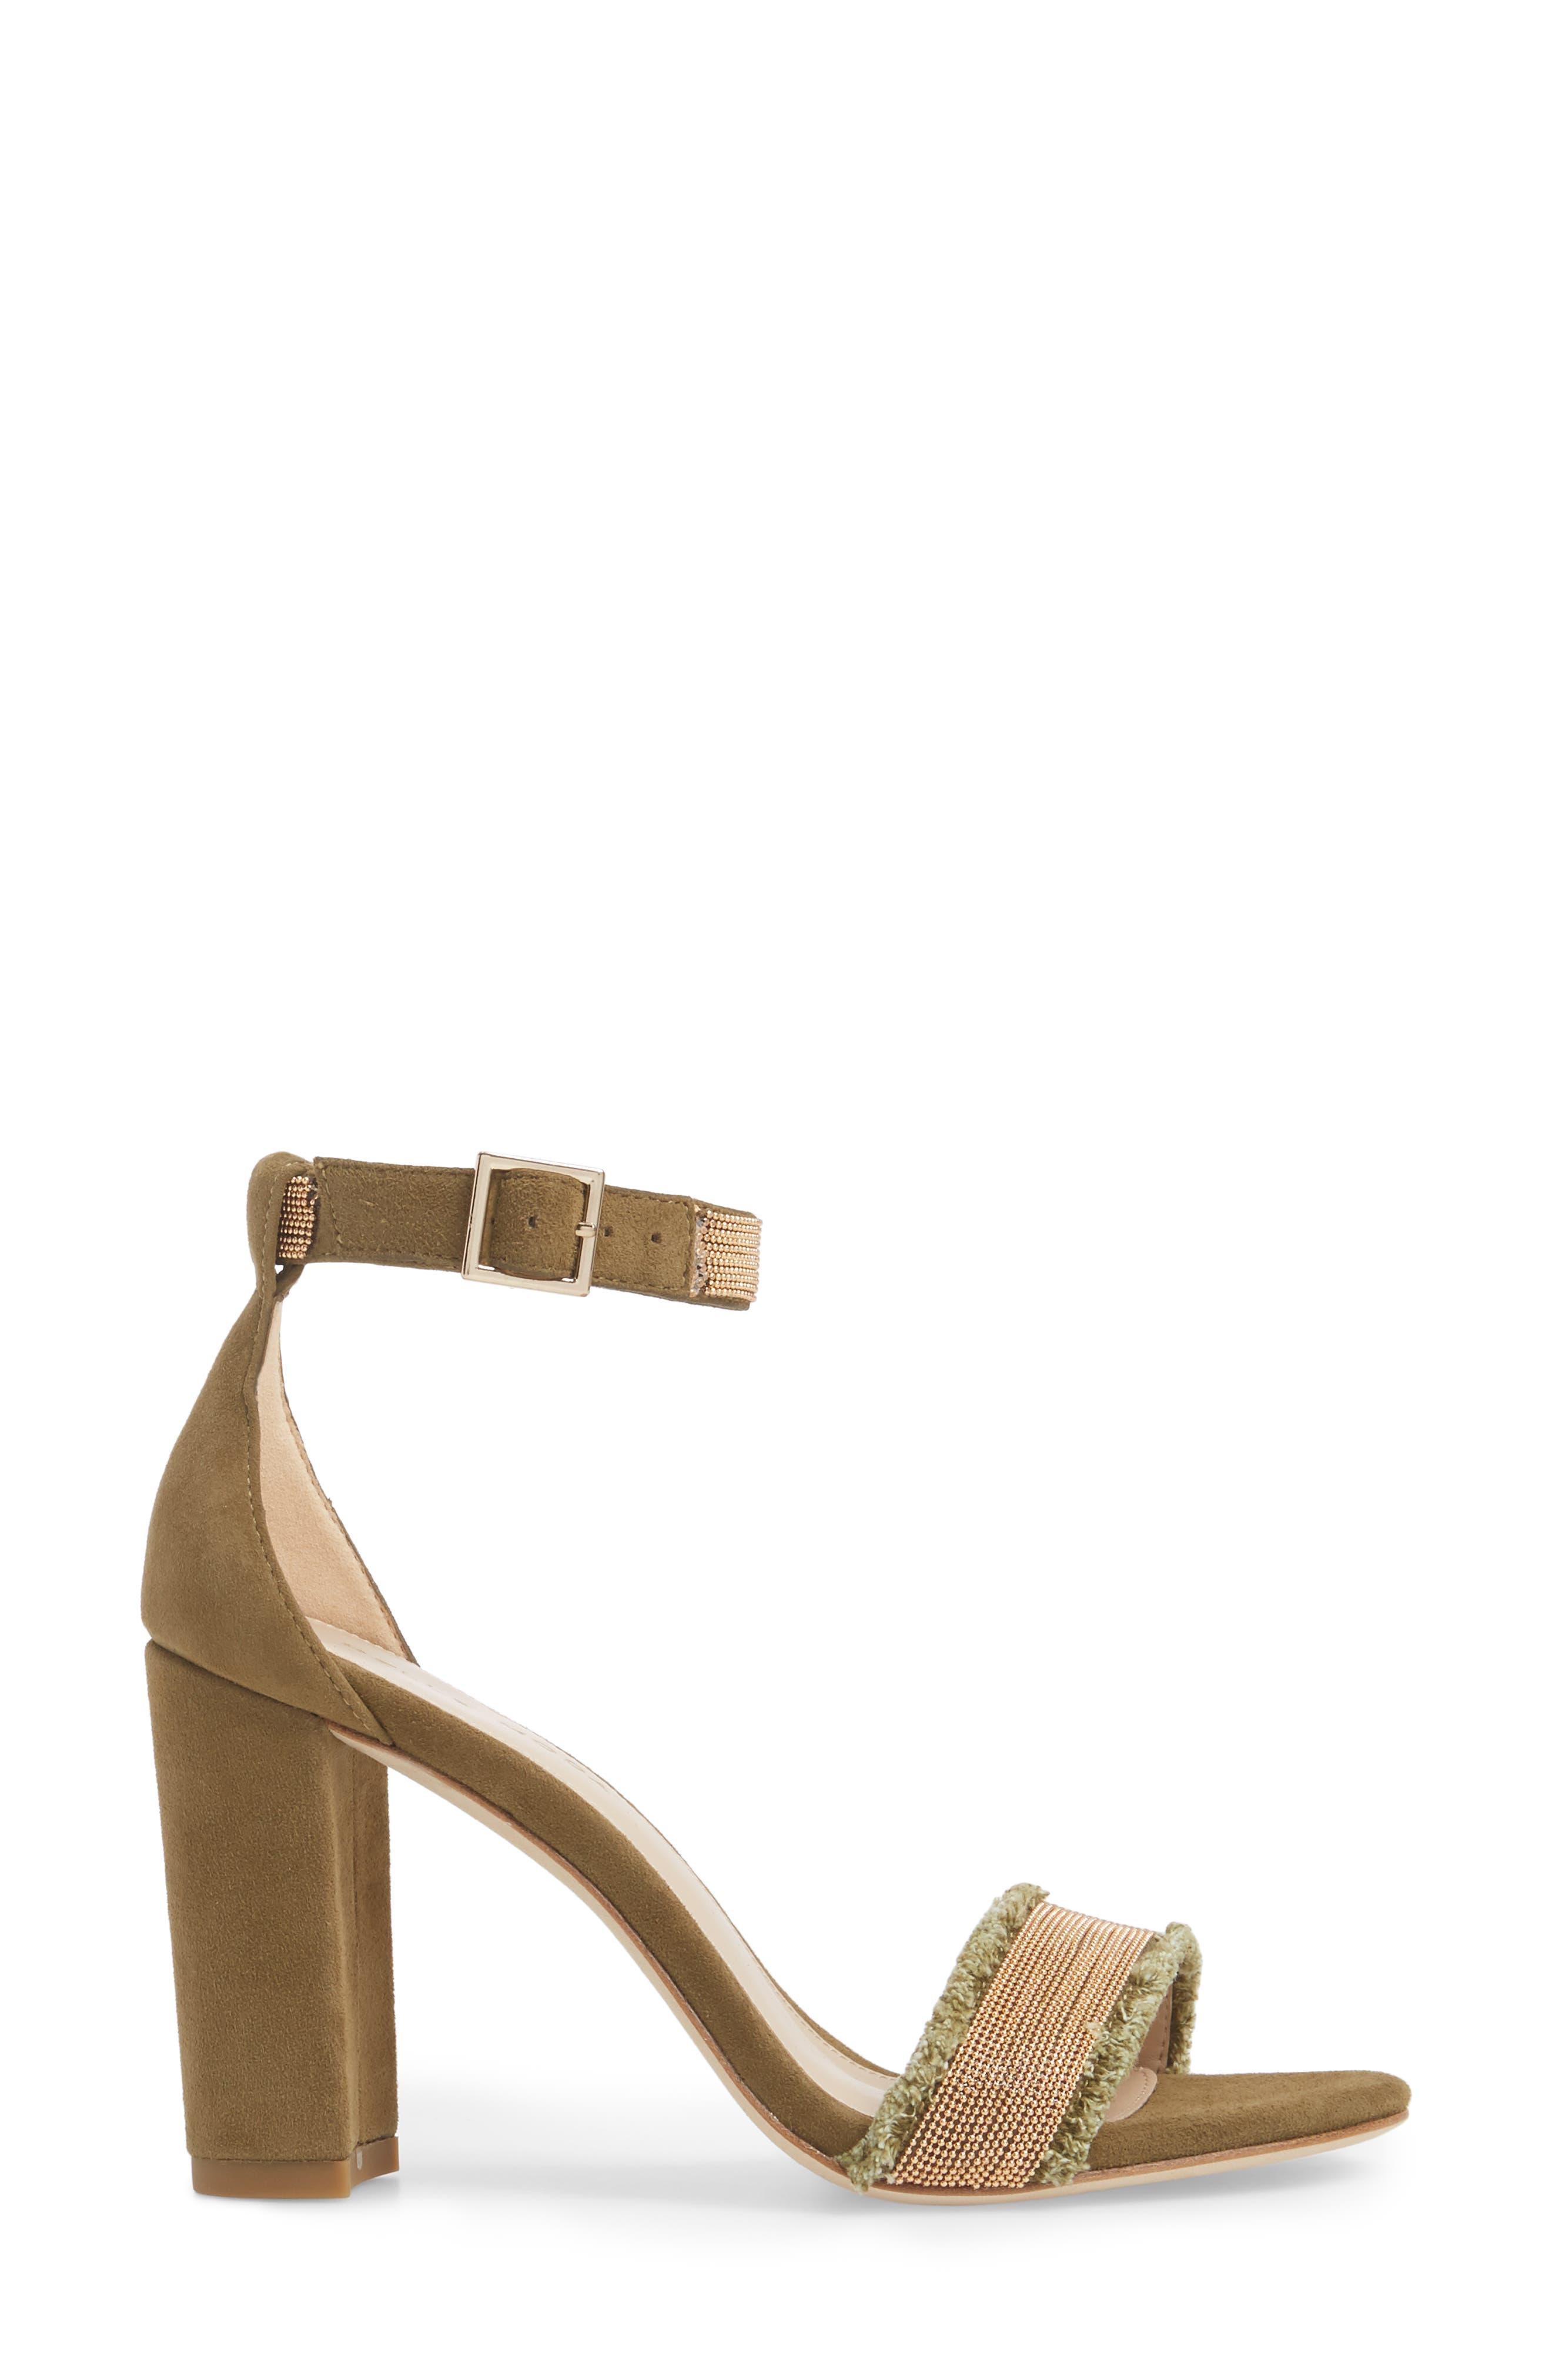 Bonnie6 Embellished Sandal,                             Alternate thumbnail 3, color,                             KHAKI SUEDE